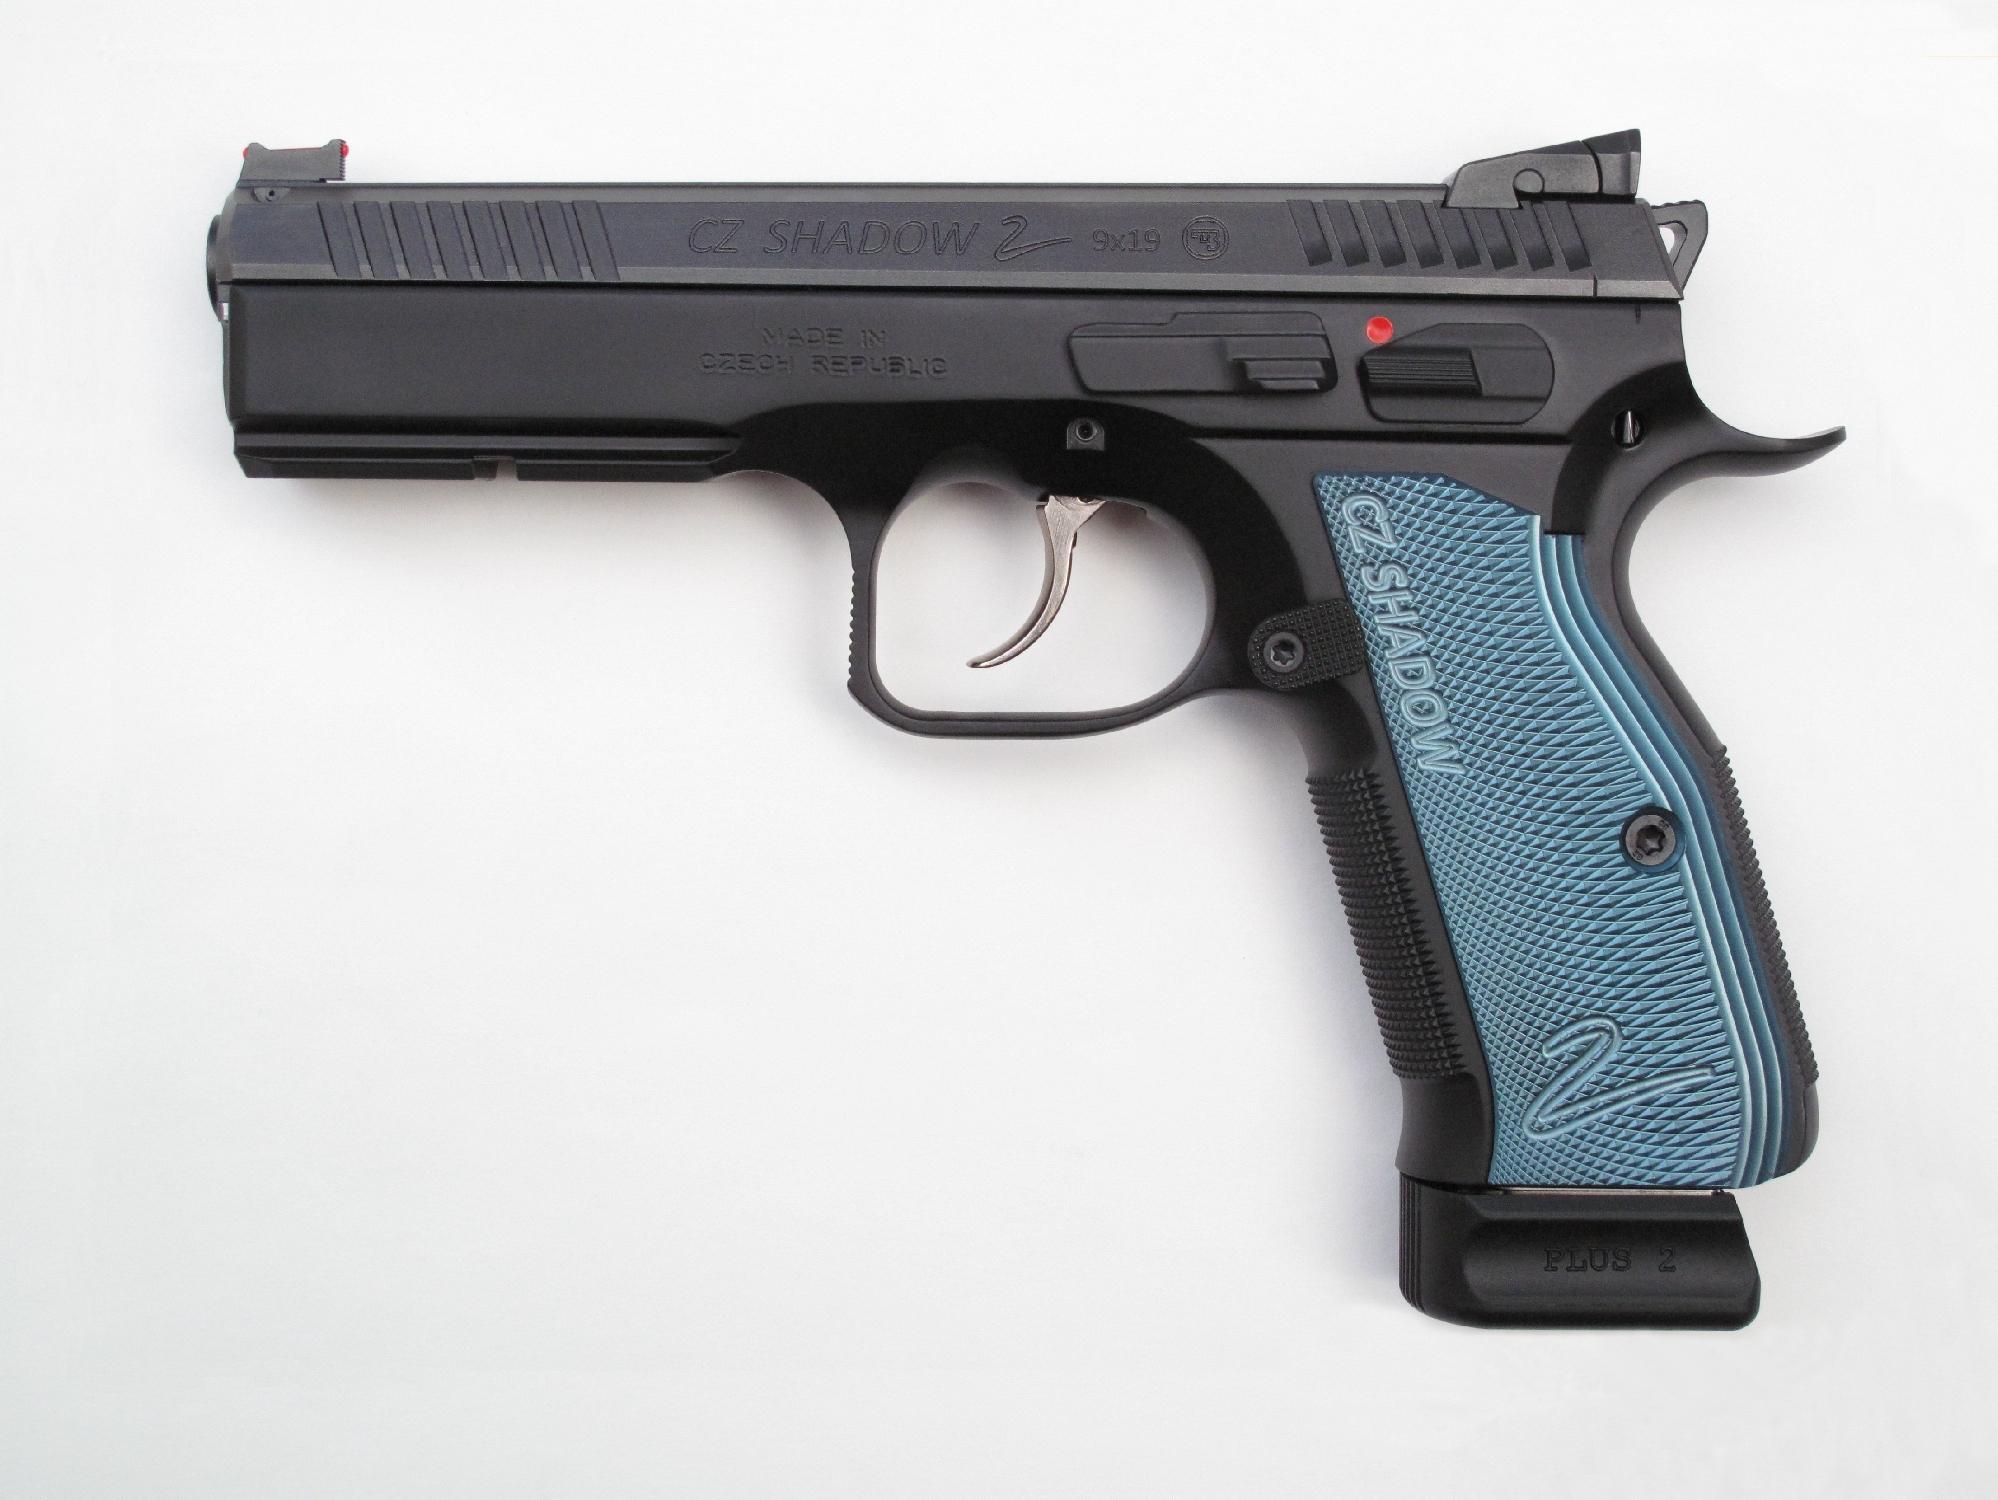 94b915a9aad7fd Pistolet semi-automatique CZ 75 « Shadow 2 » en calibre 9 mm Parabellum.